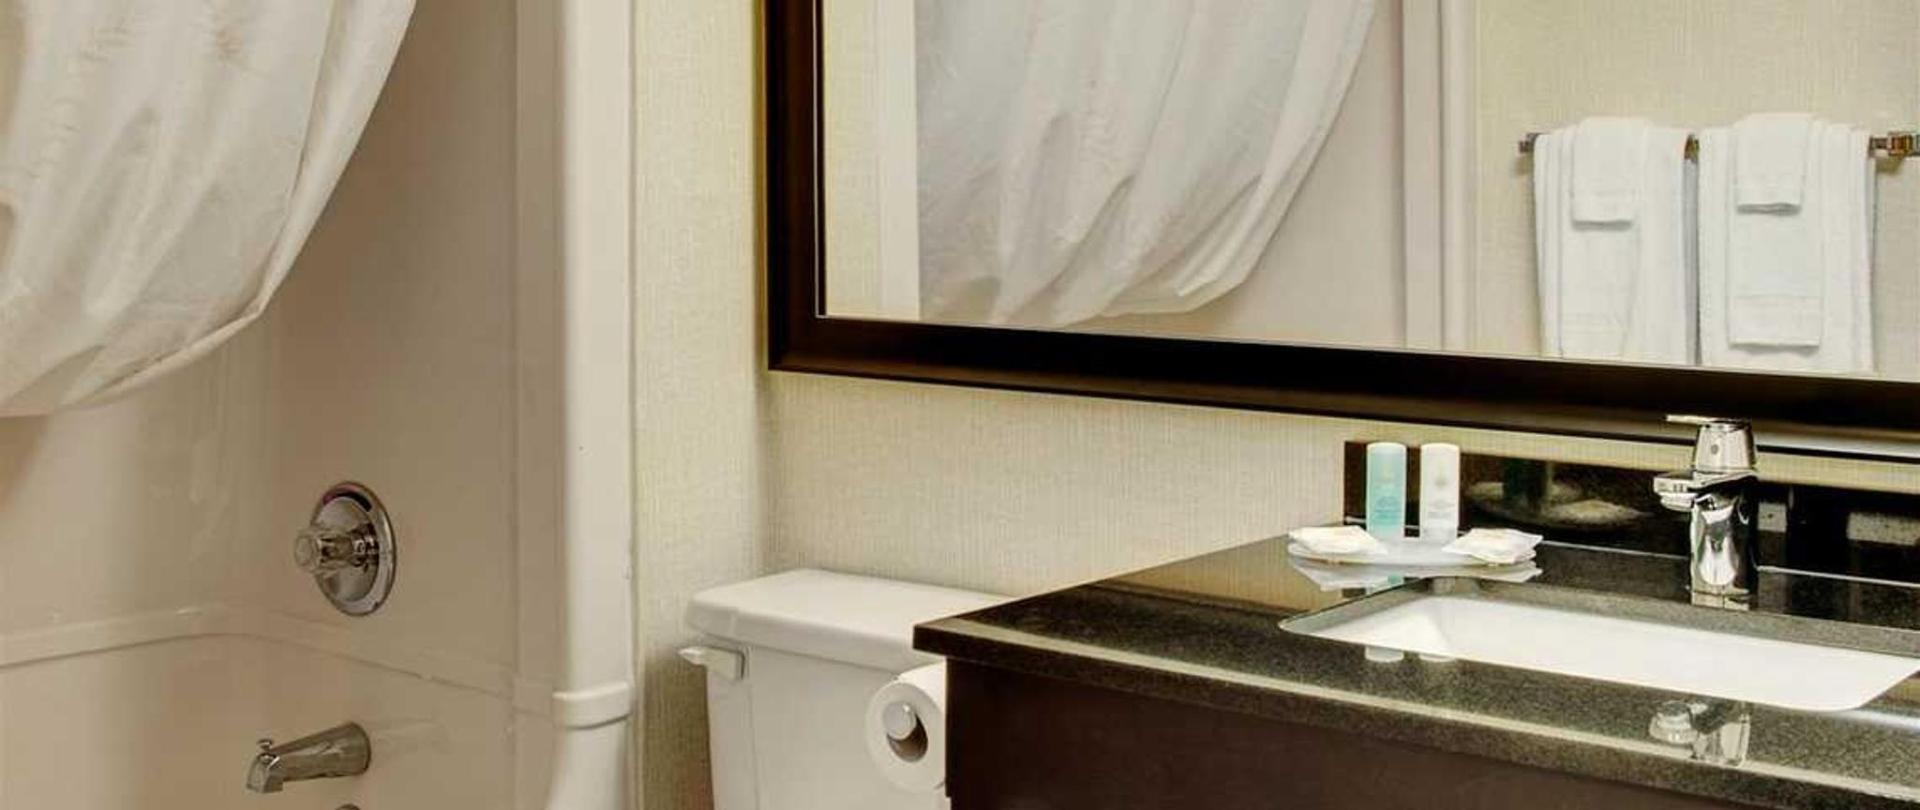 stylish-vanity-and-curved-shower-rod.jpg.1140x481_default.jpg